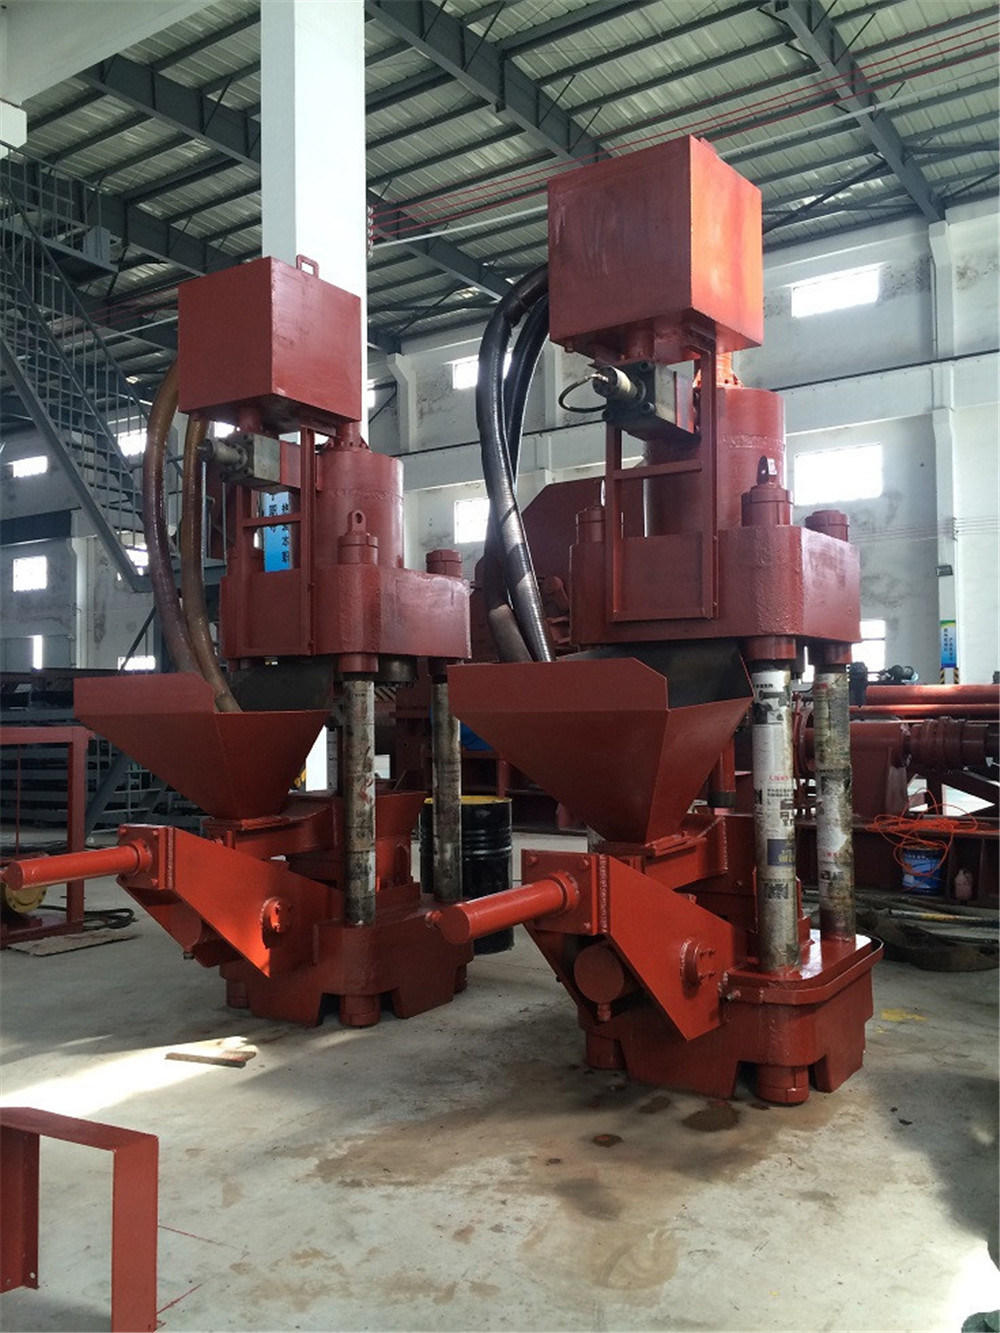 Y83-500 Series of Scrap Press Machine